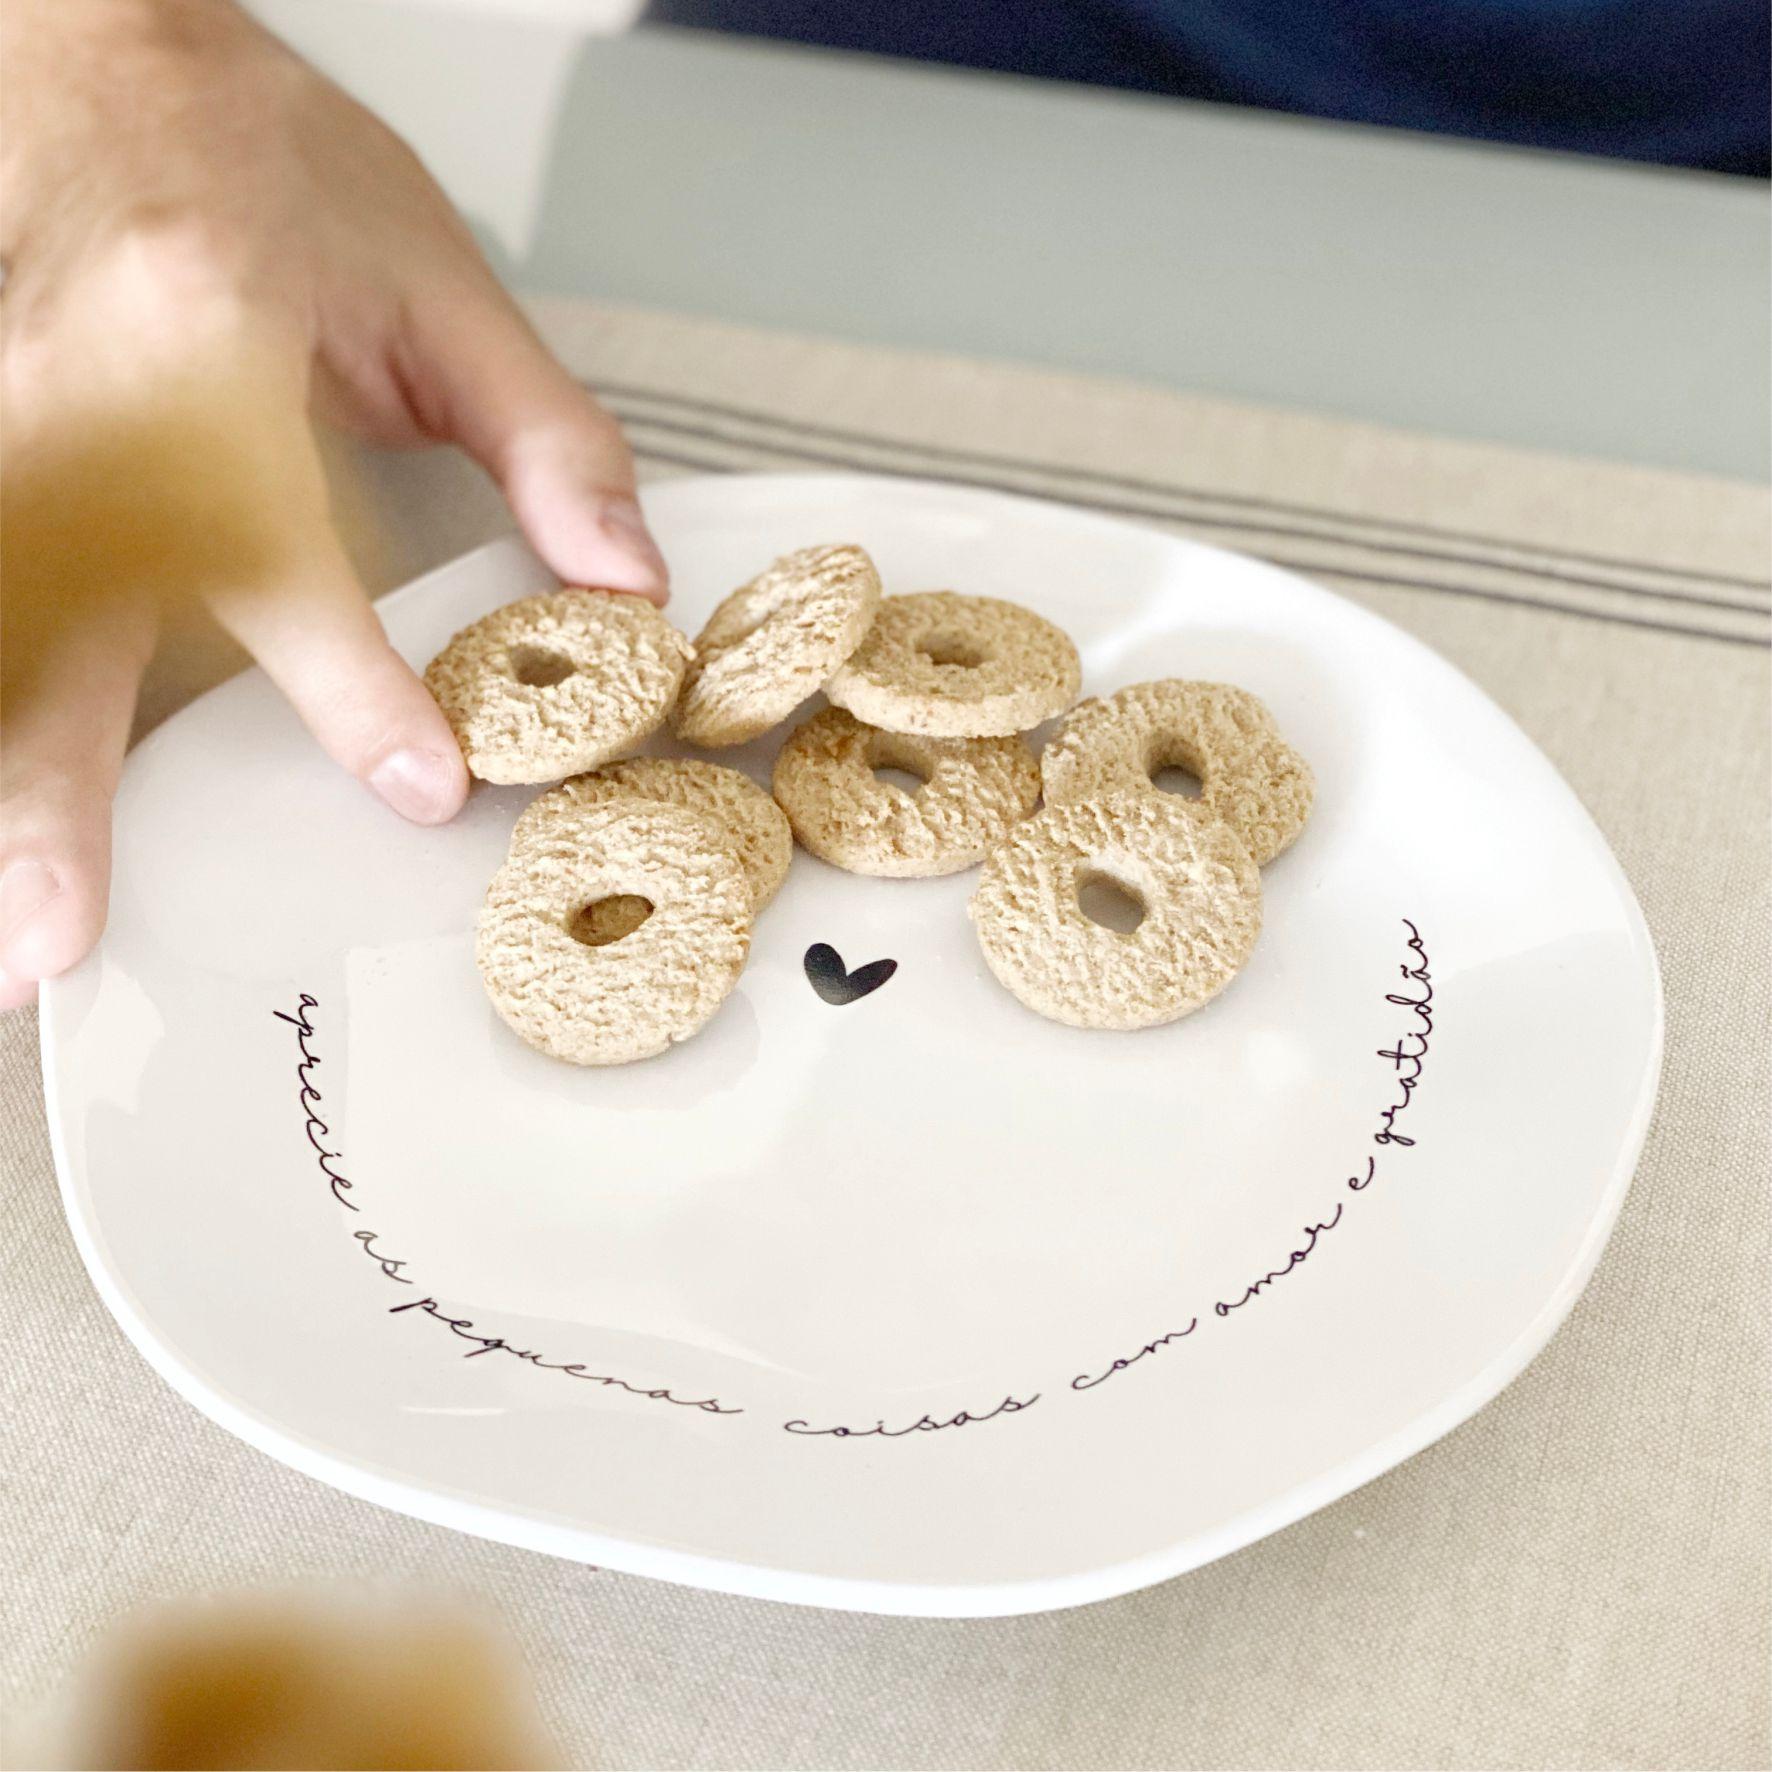 Prato de Sobremesa de Porcelana Geométrico Branco Aprecie